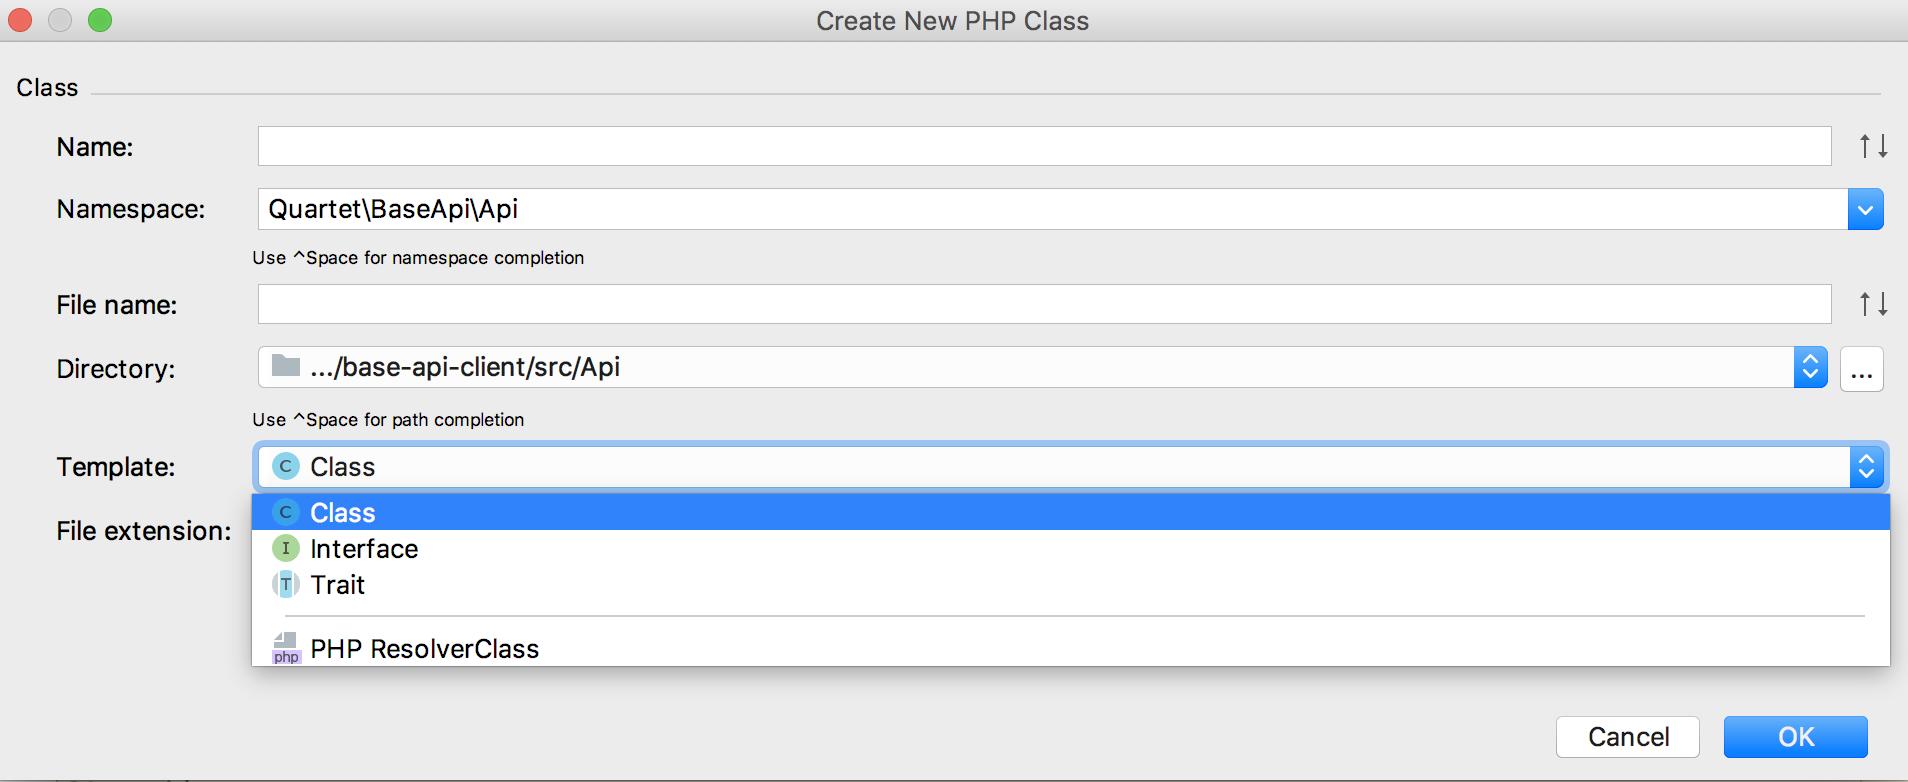 CreateNewPHPClassでTemplateとしてPHP ResolverClassを選ぶ